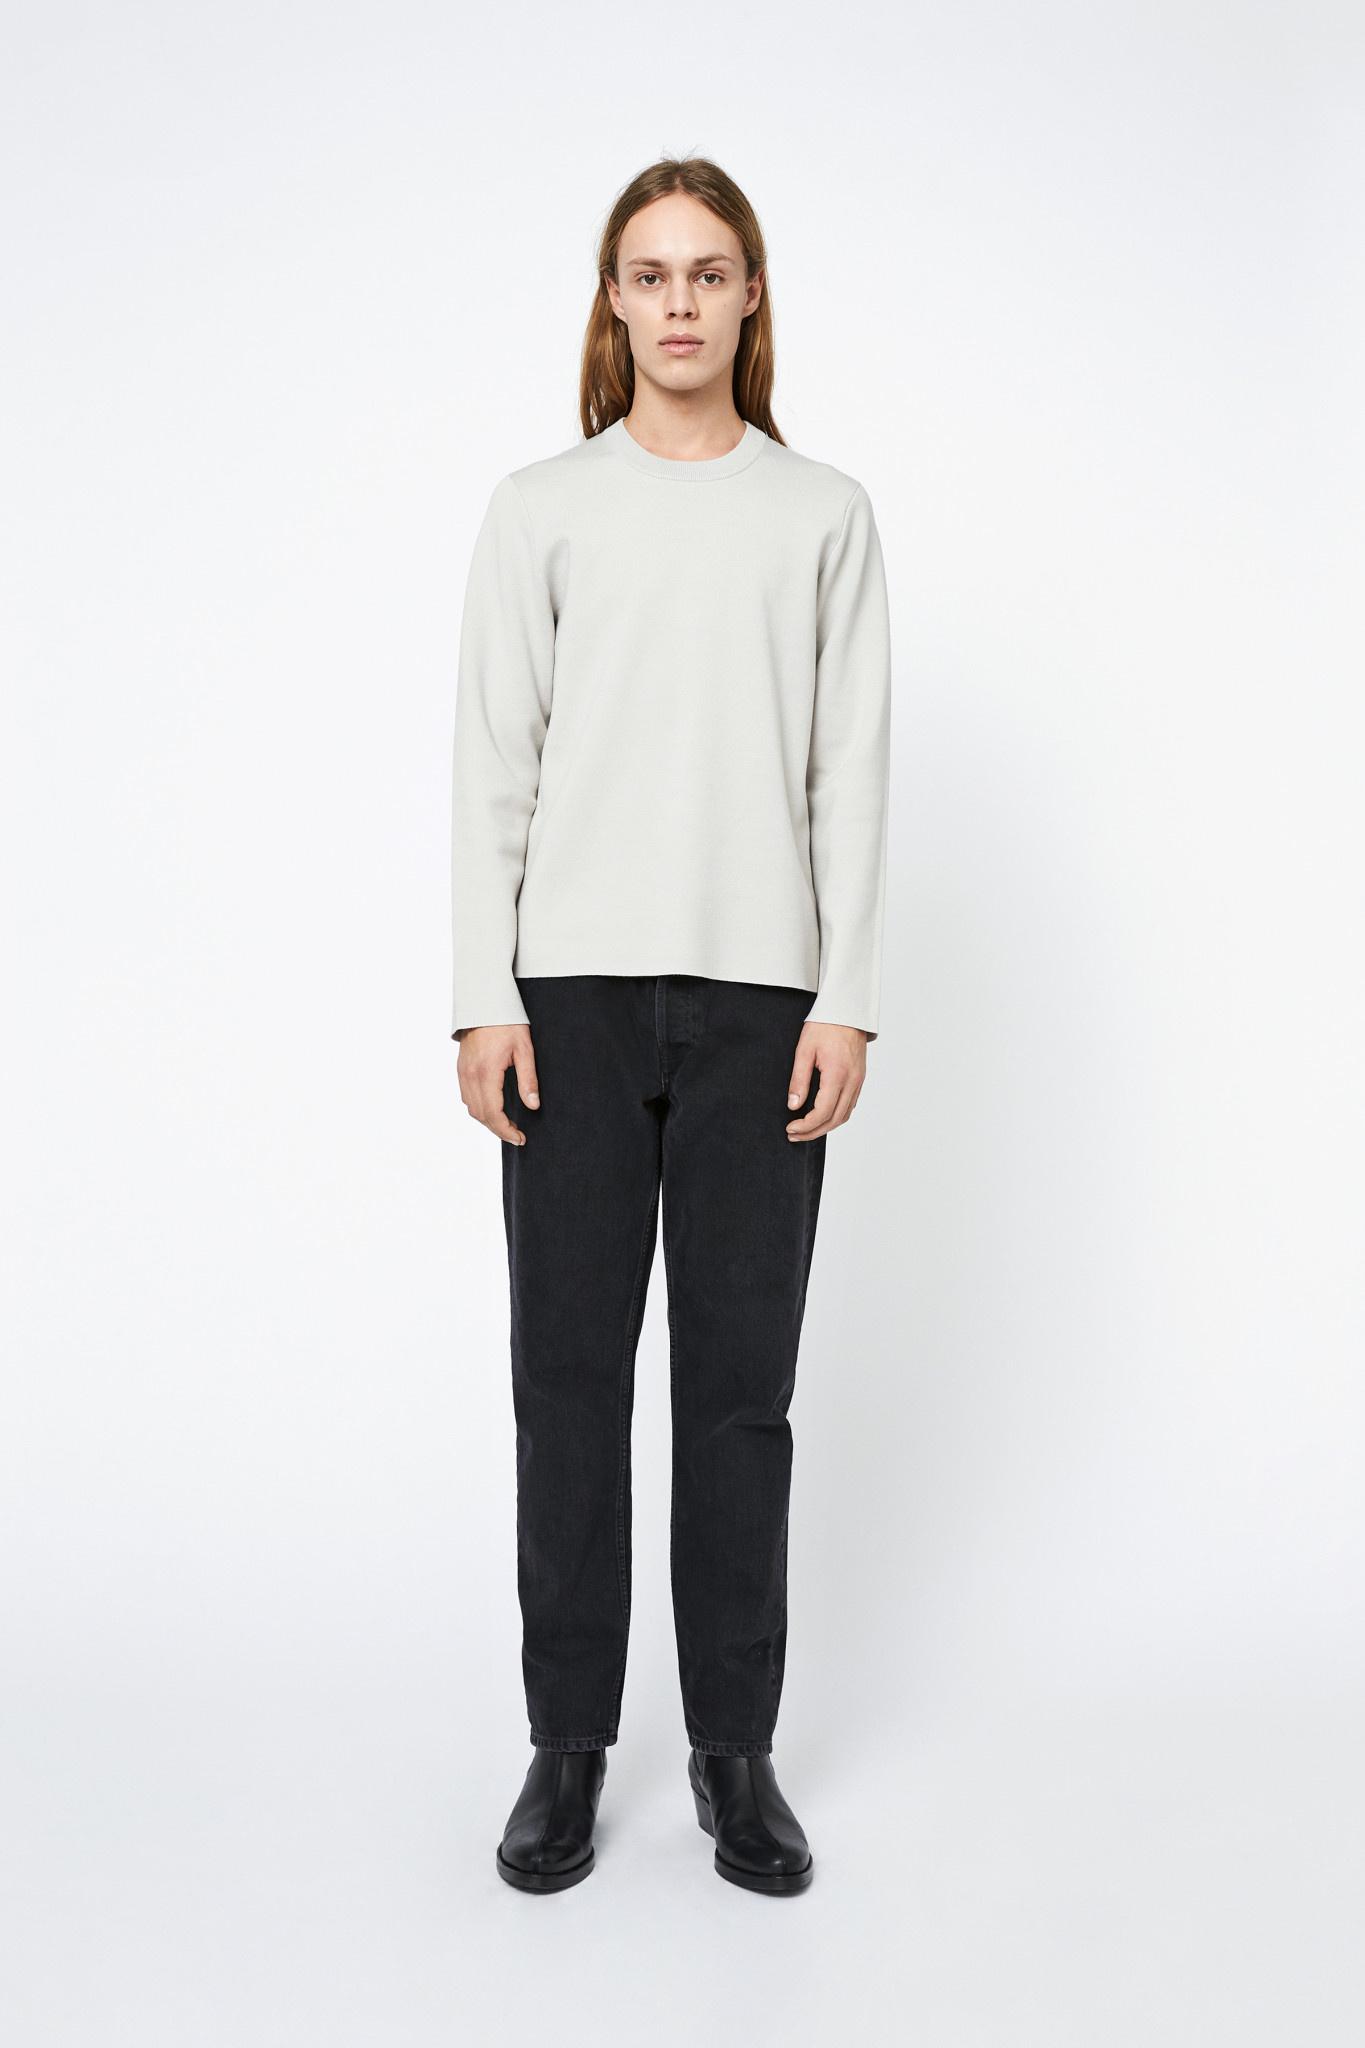 Benton Knit - Cream-1